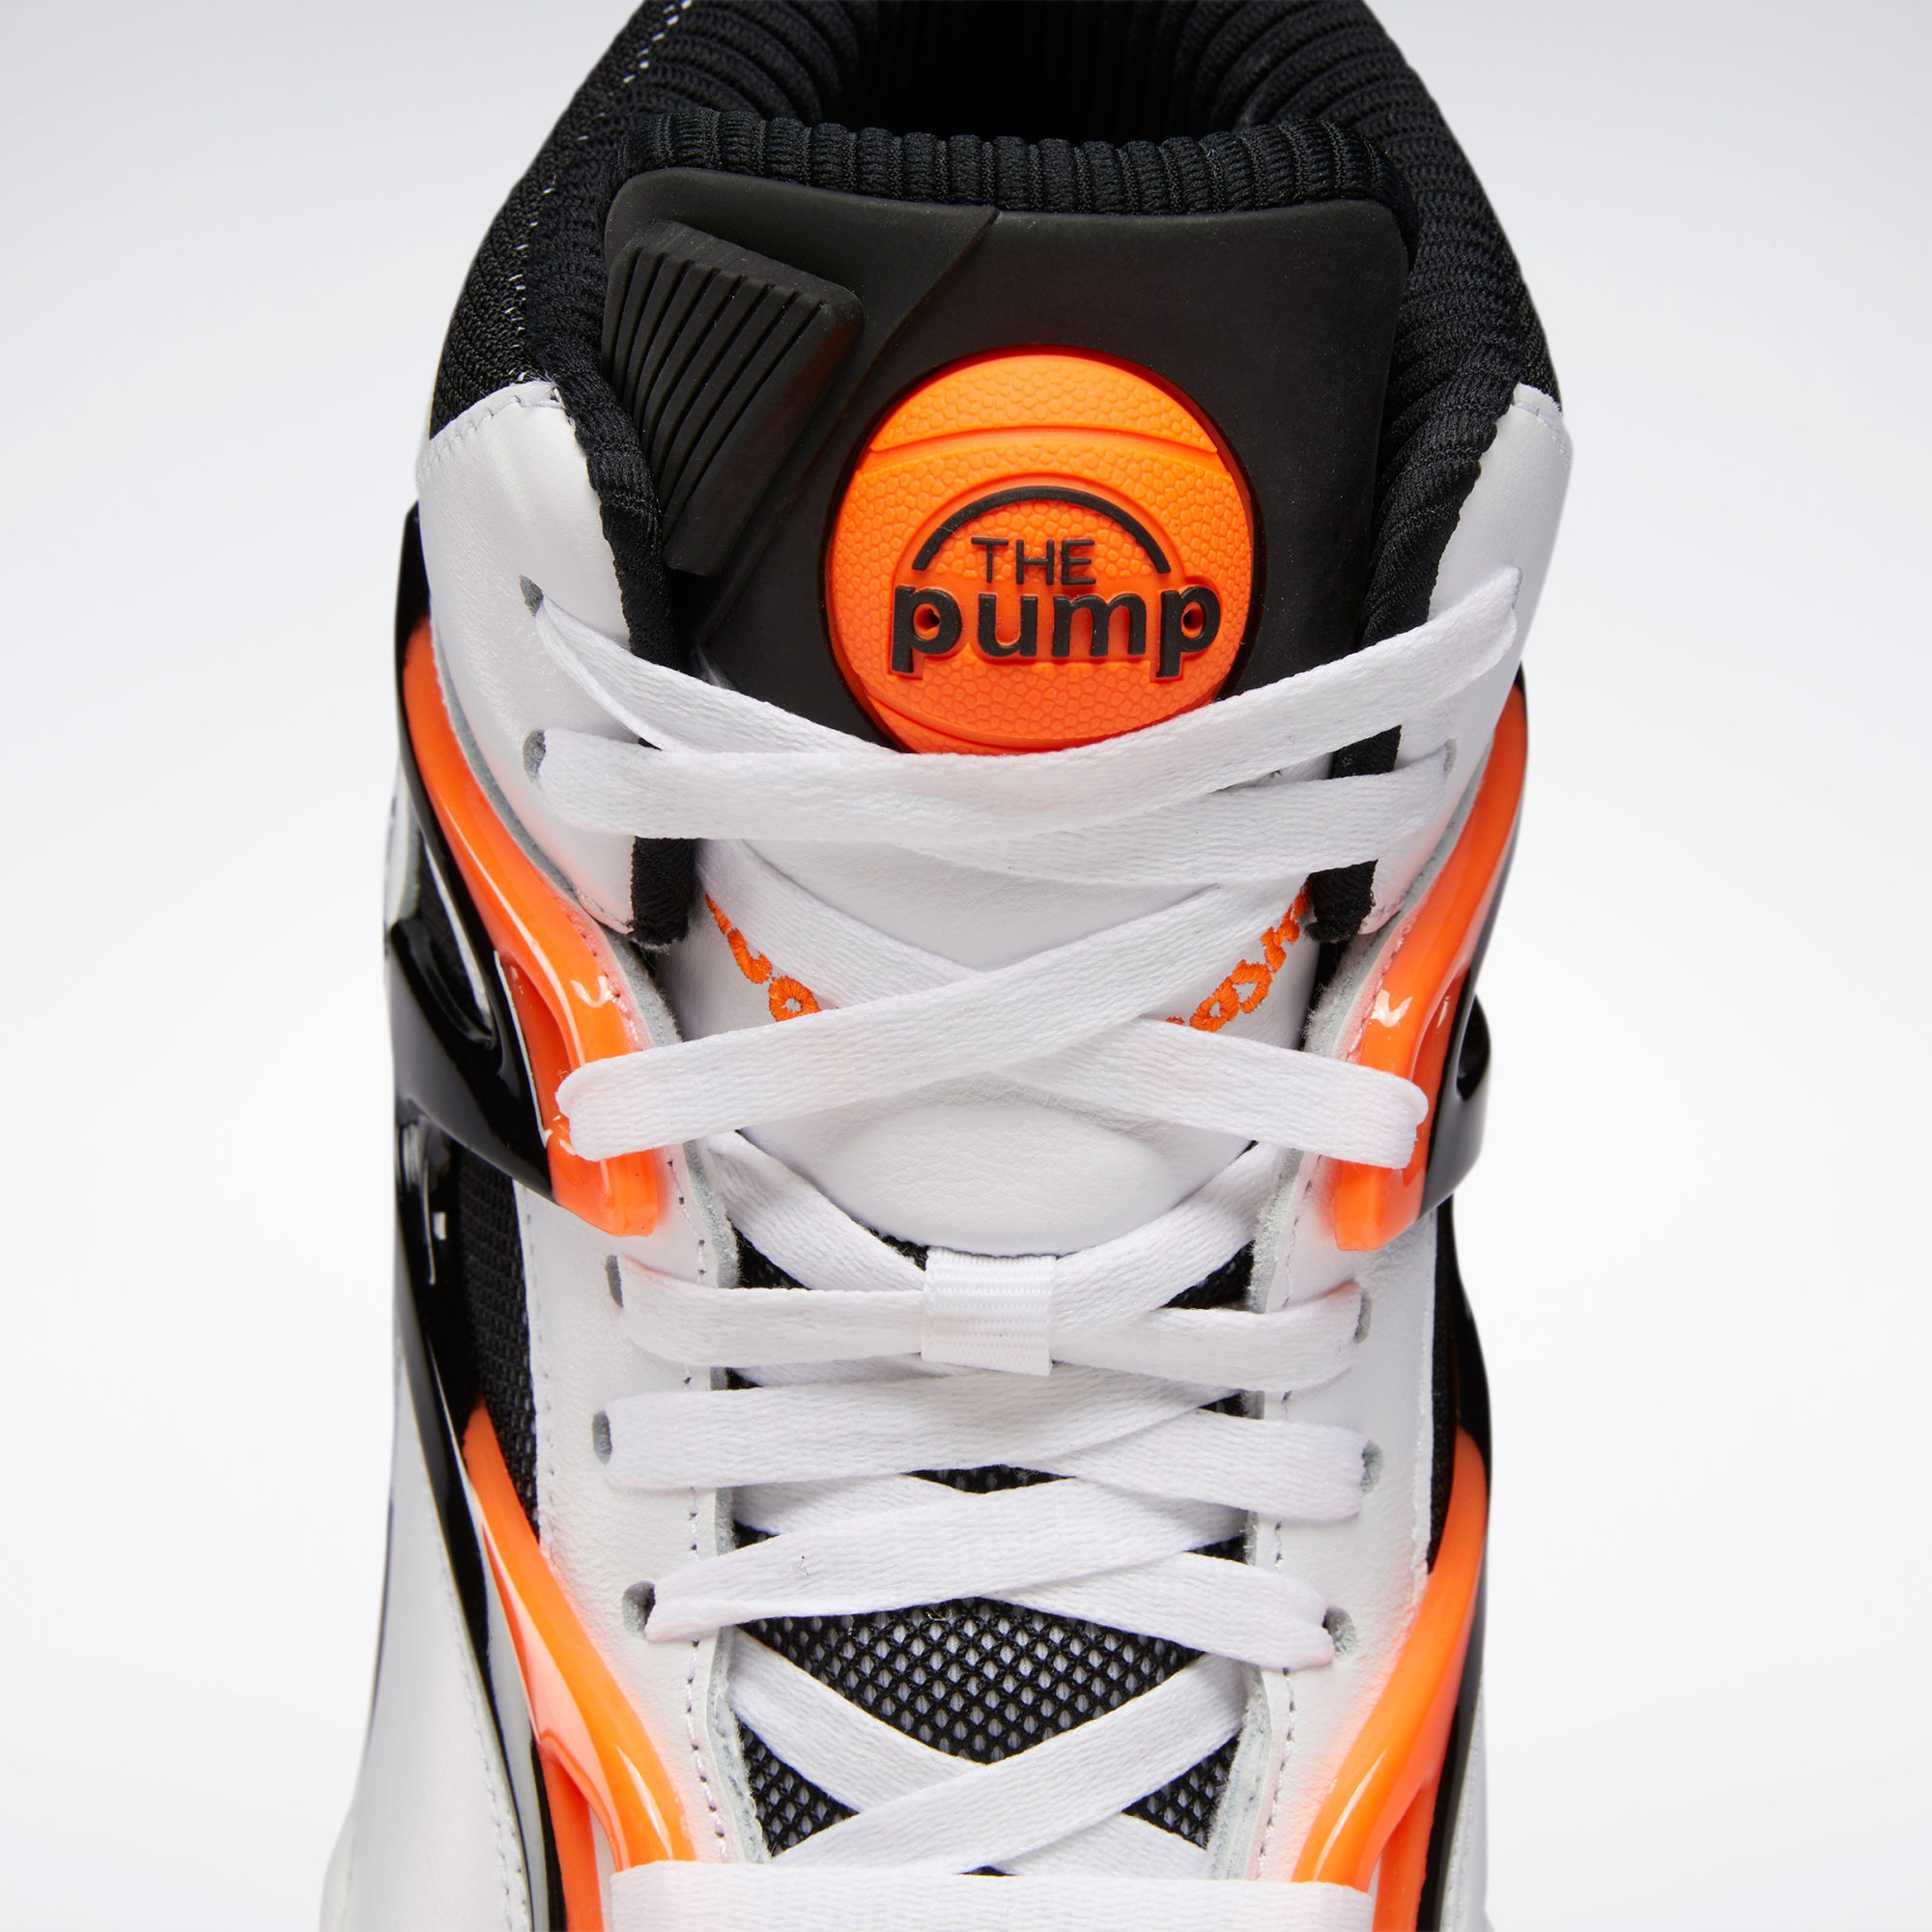 reebok-pump-omni-zone-2021-white-black-orange-6